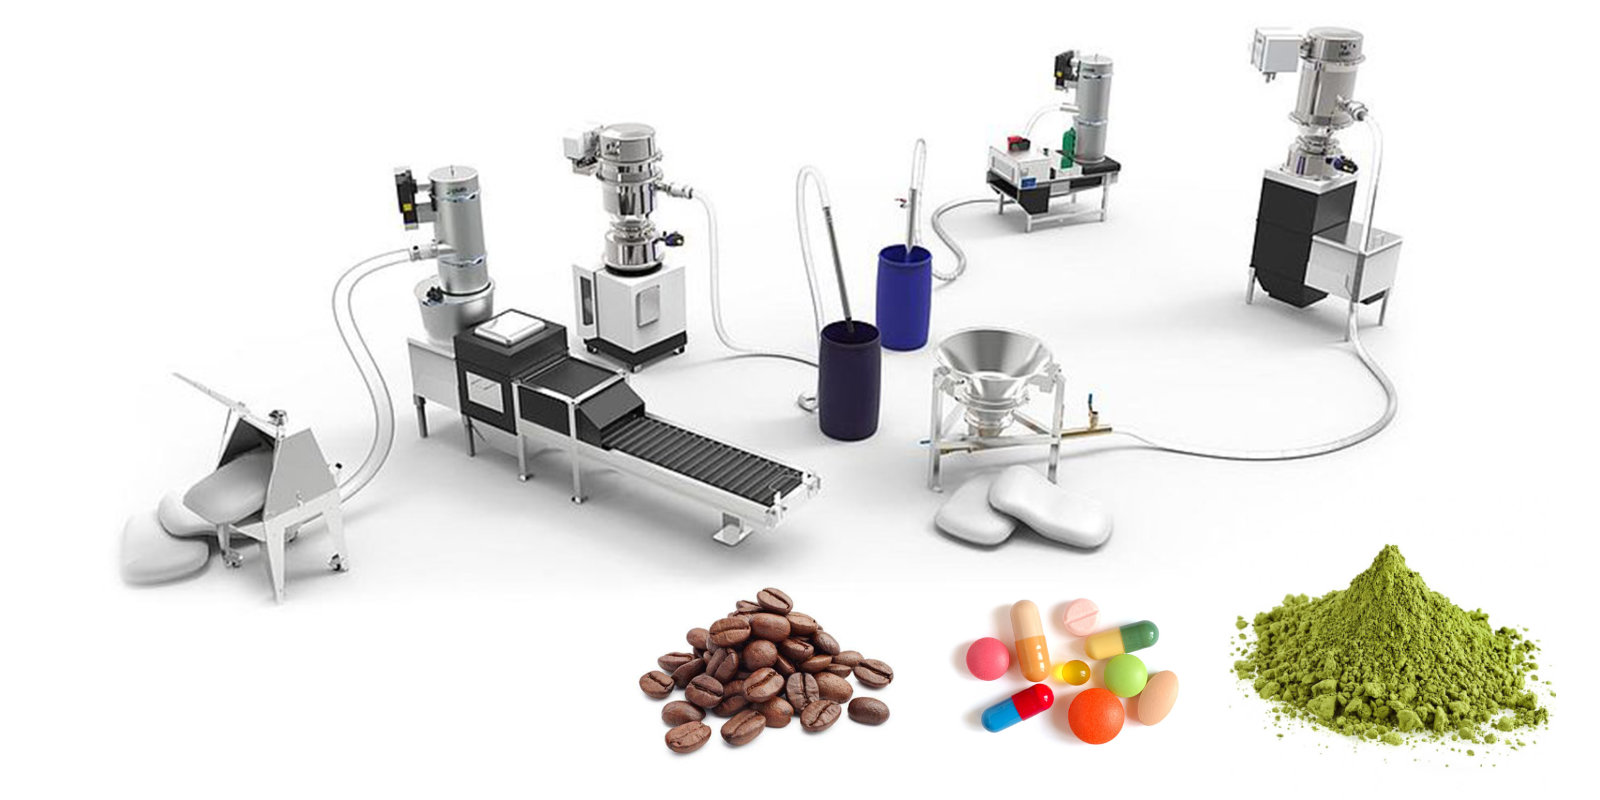 Vakuumtransport piller, pulver og tabletter